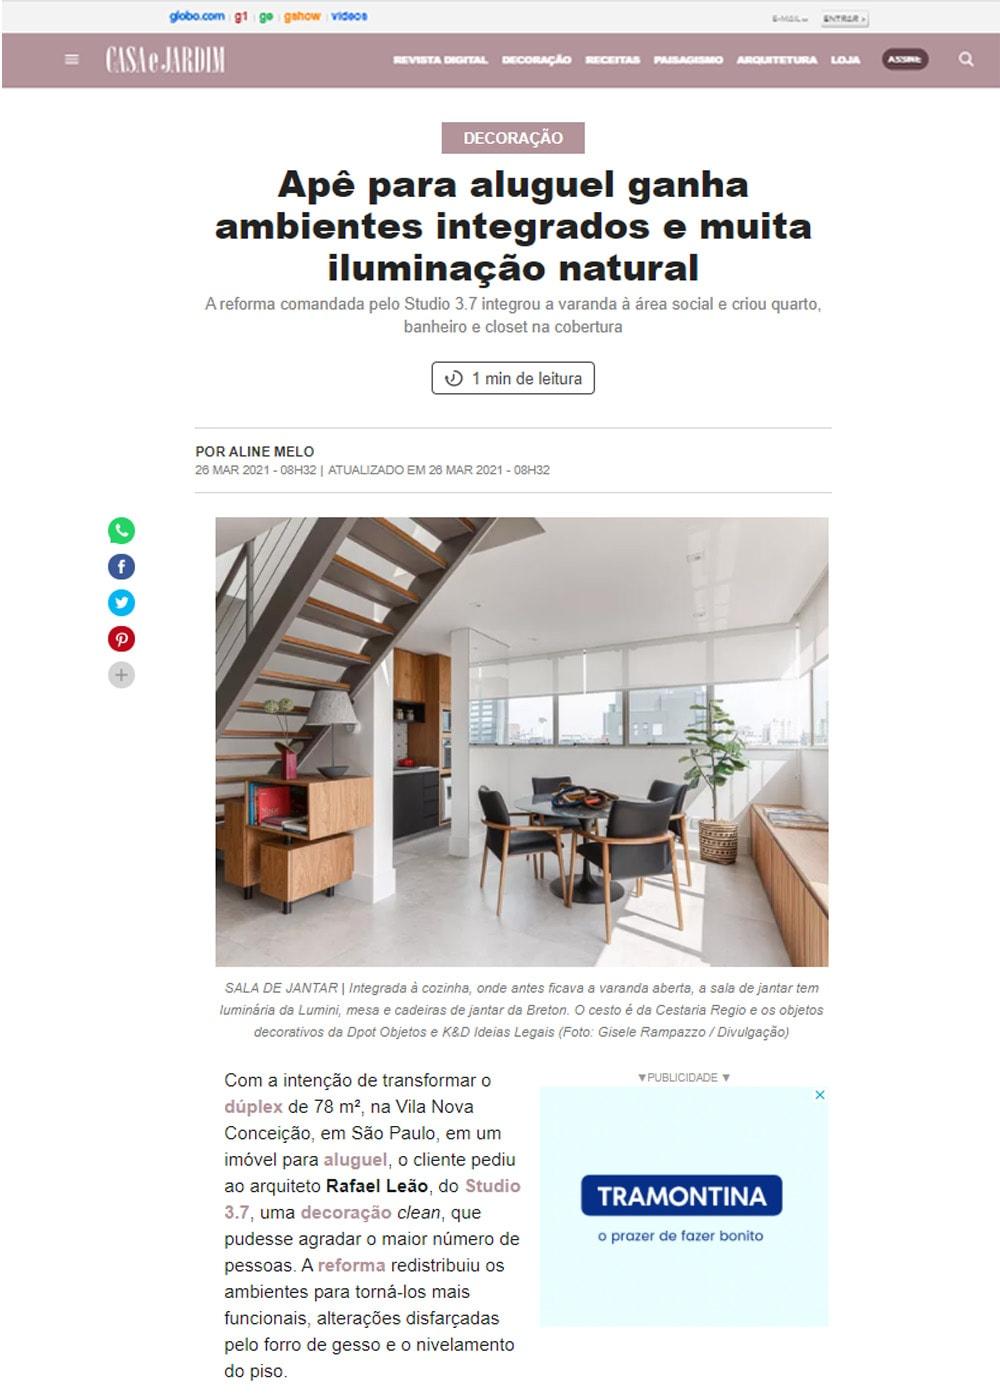 clipping futon company apê para aluguel recebe poltrona Paulistano